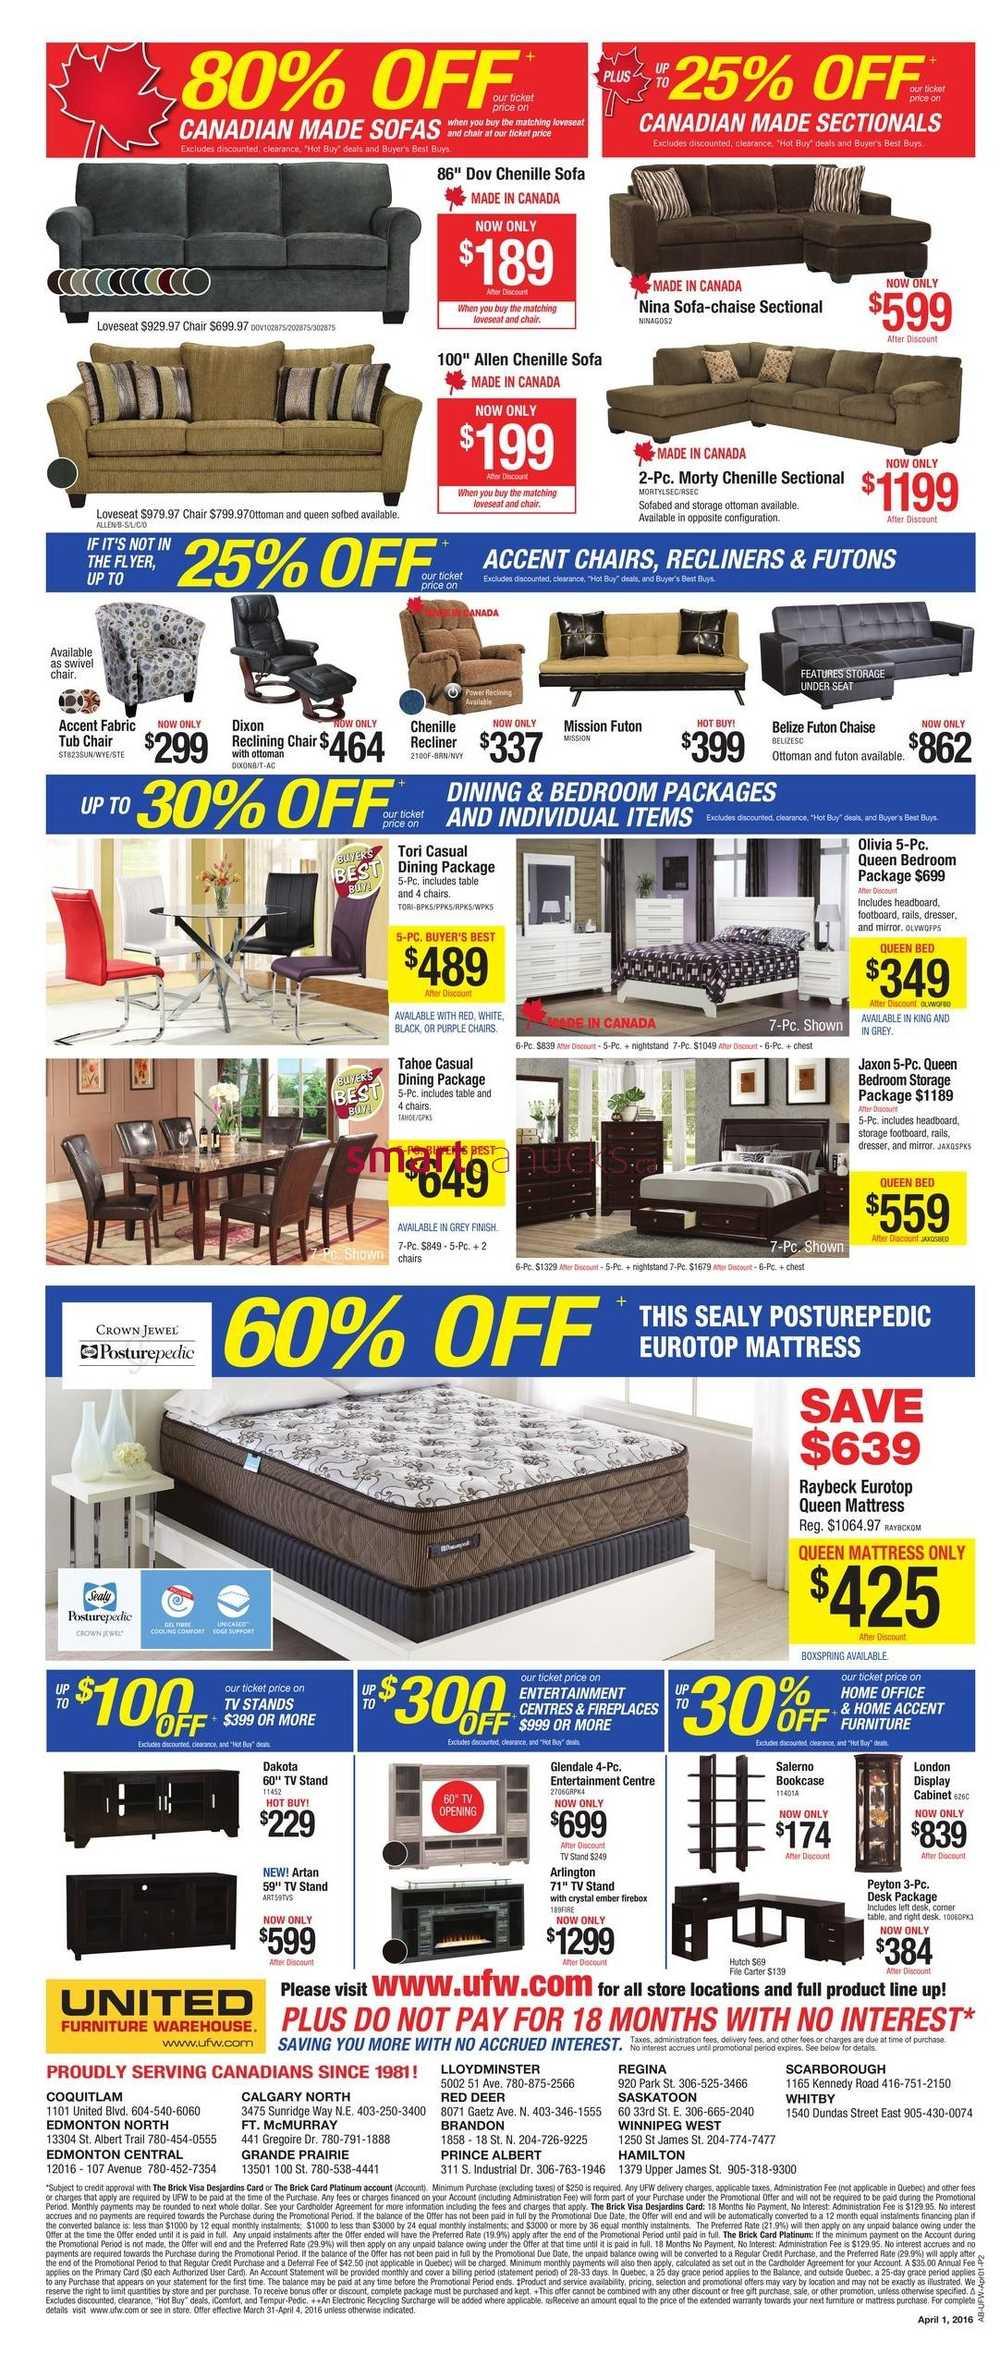 United Furniture Warehouse Com